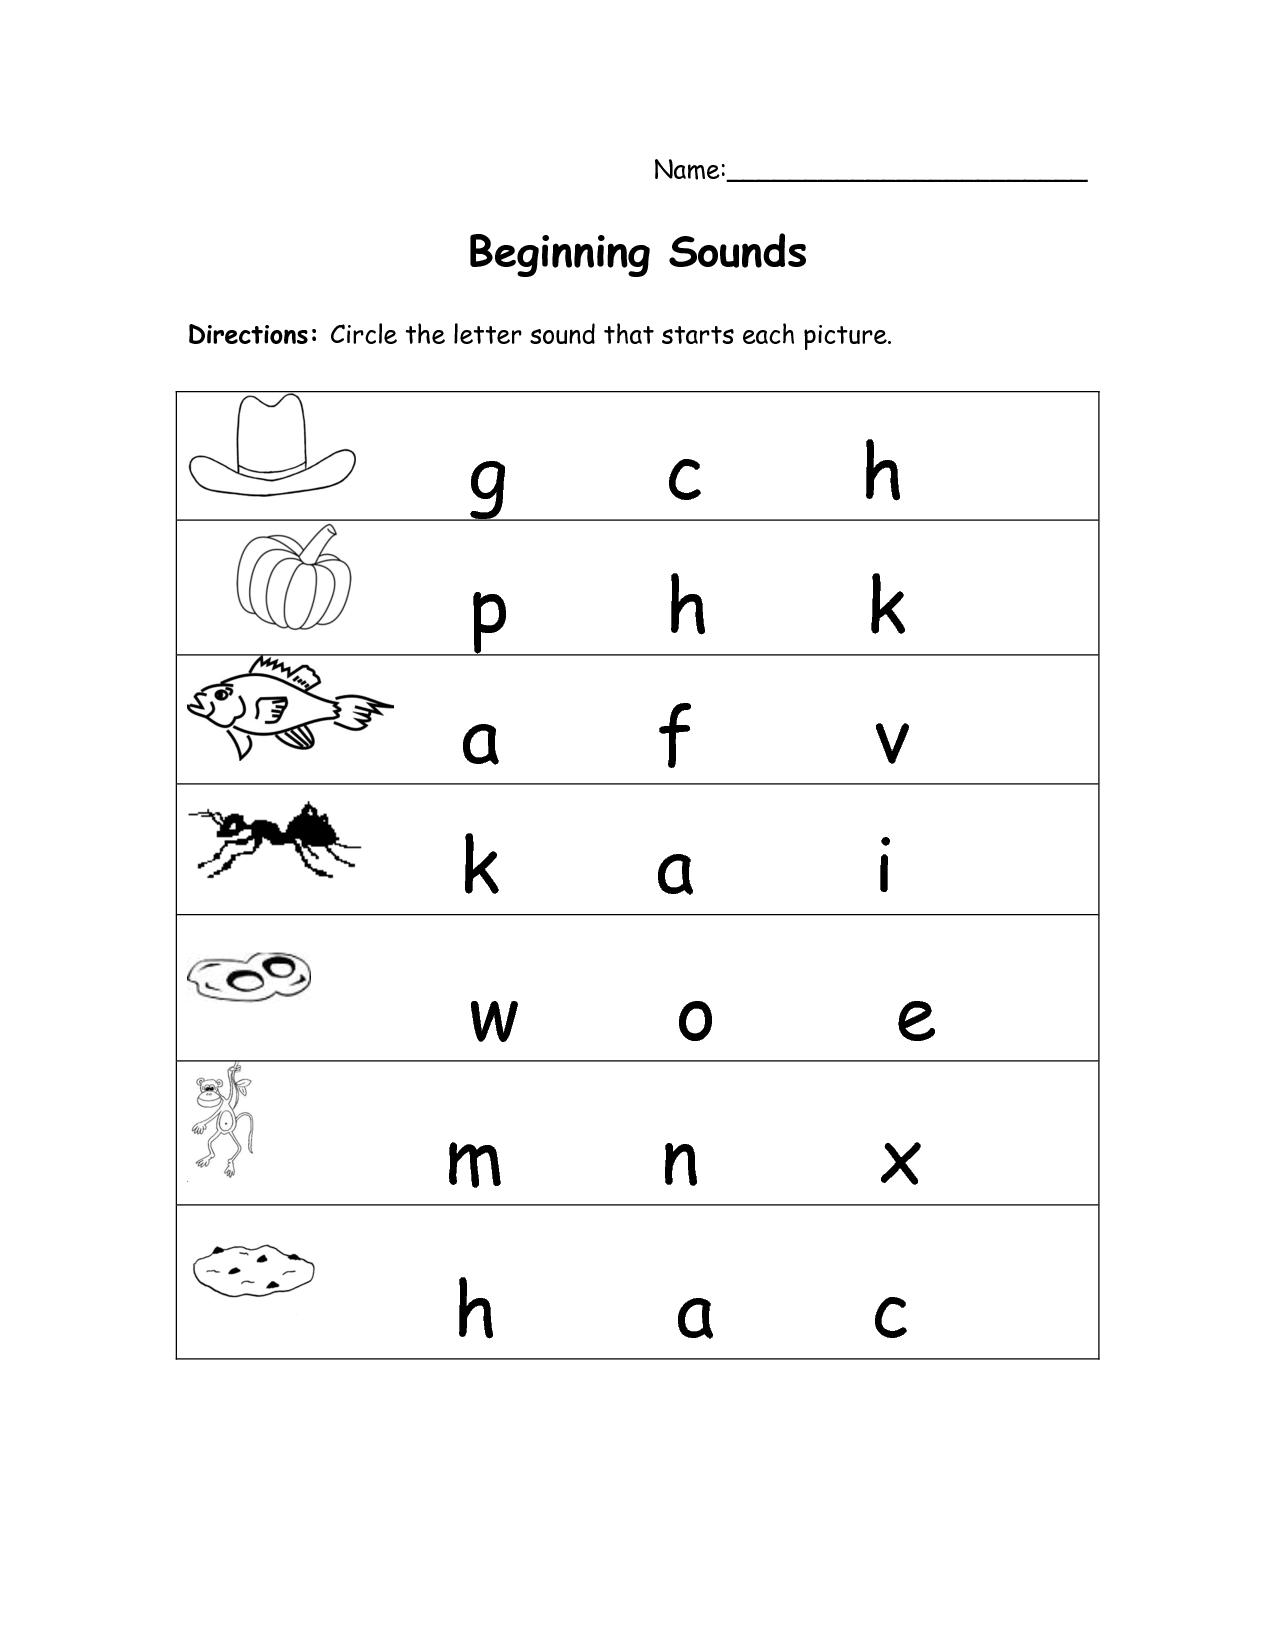 Worksheet Initial Sound Worksheets For Kindergarten worksheet kindergarten sound worksheets noconformity free printable beginning sounds memarchoapraga 5 best images of free